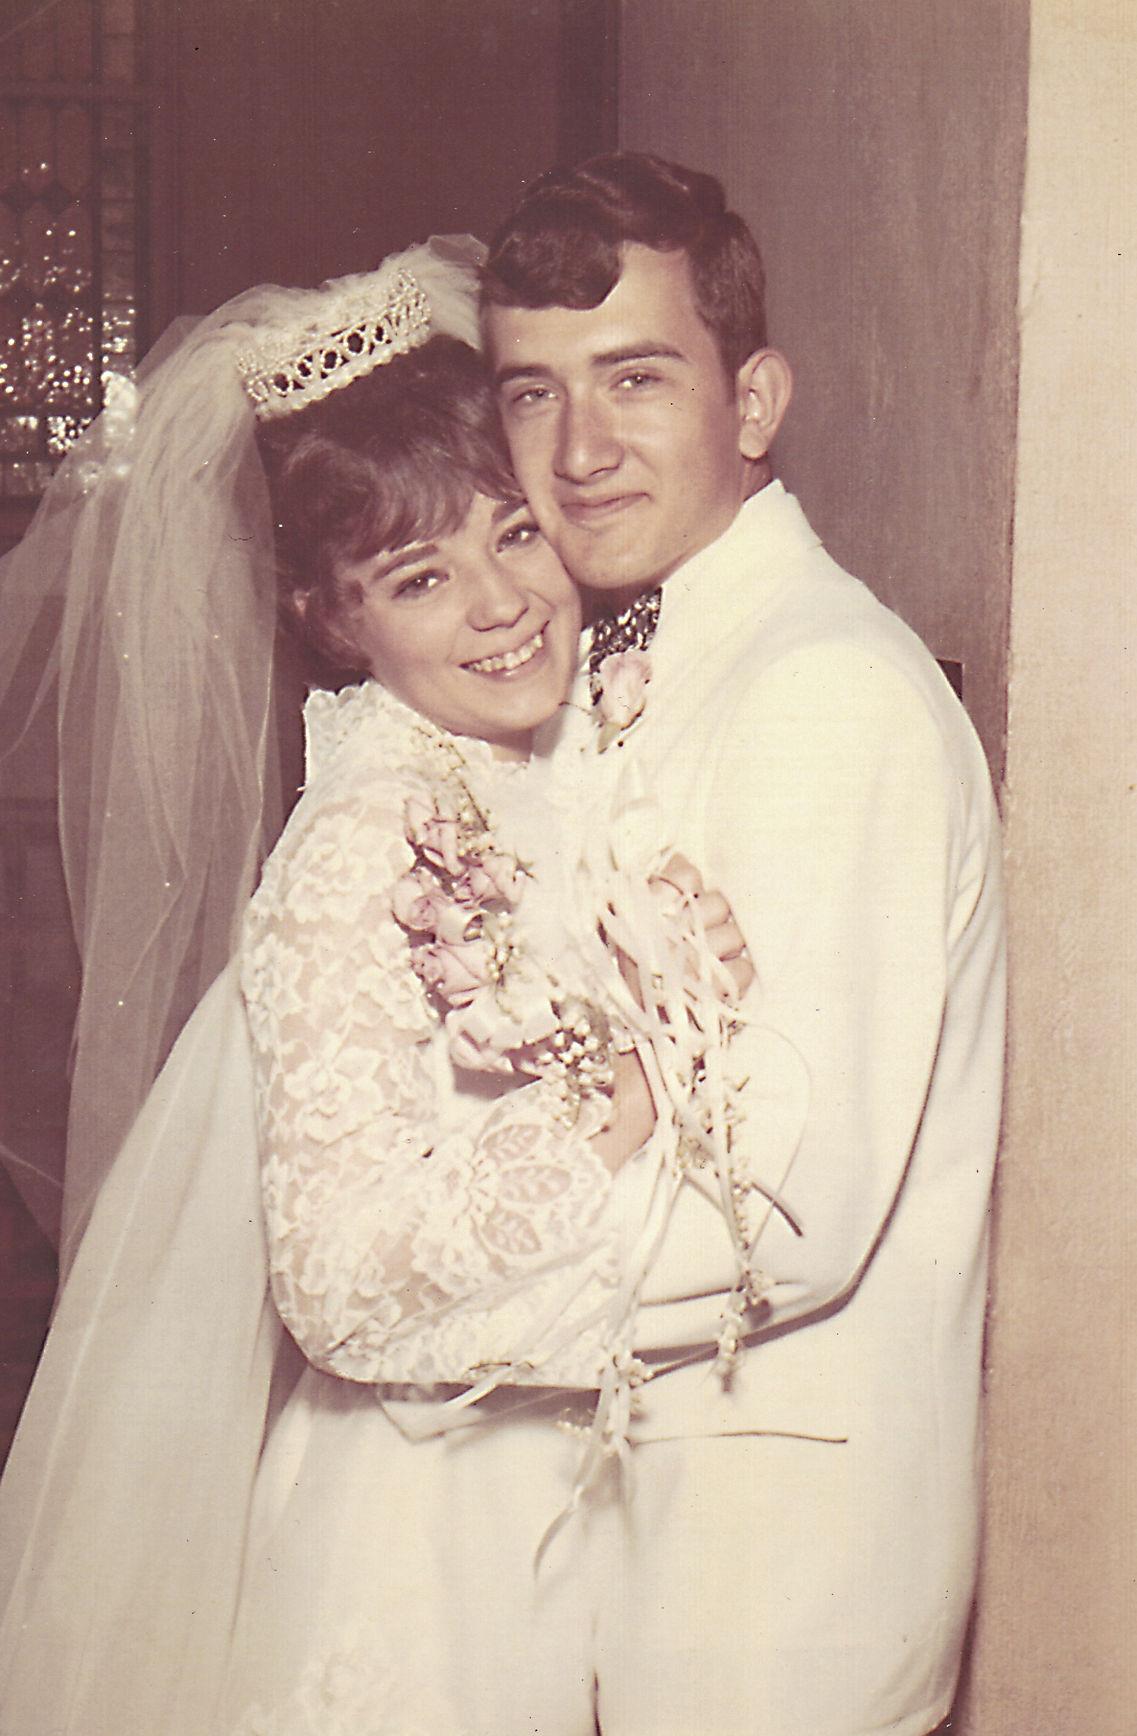 McDaniels to celebrate 50th wedding anniversary